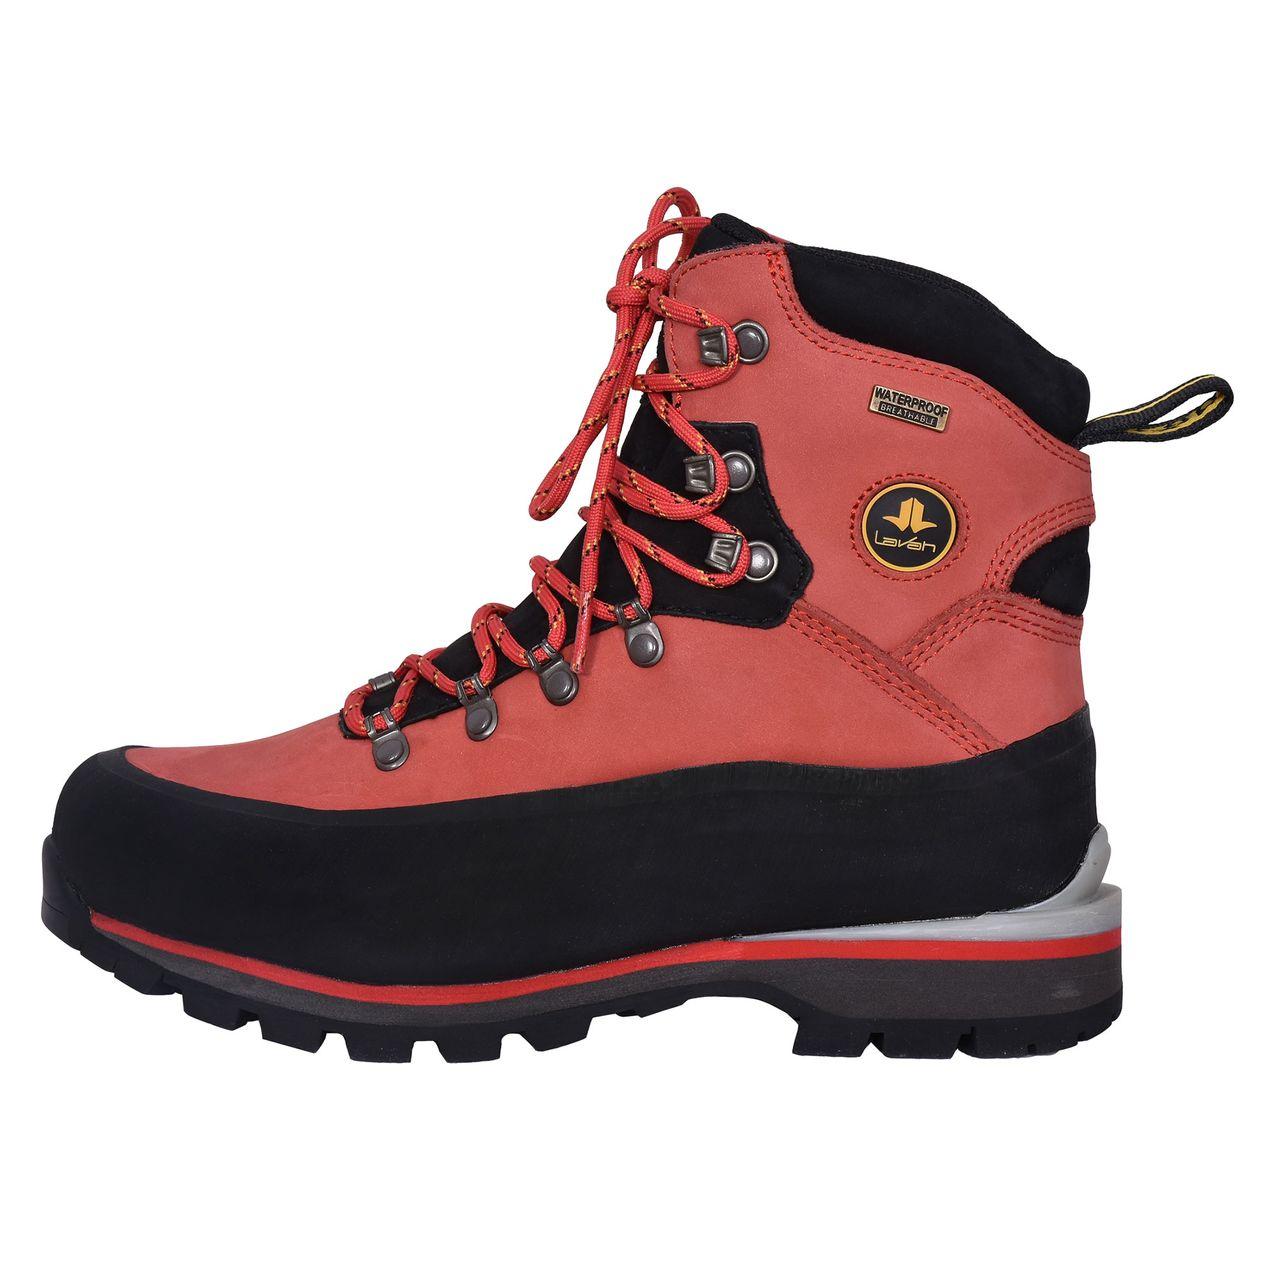 کفش کوهنوردی زنانه لاوان مدل دماوند